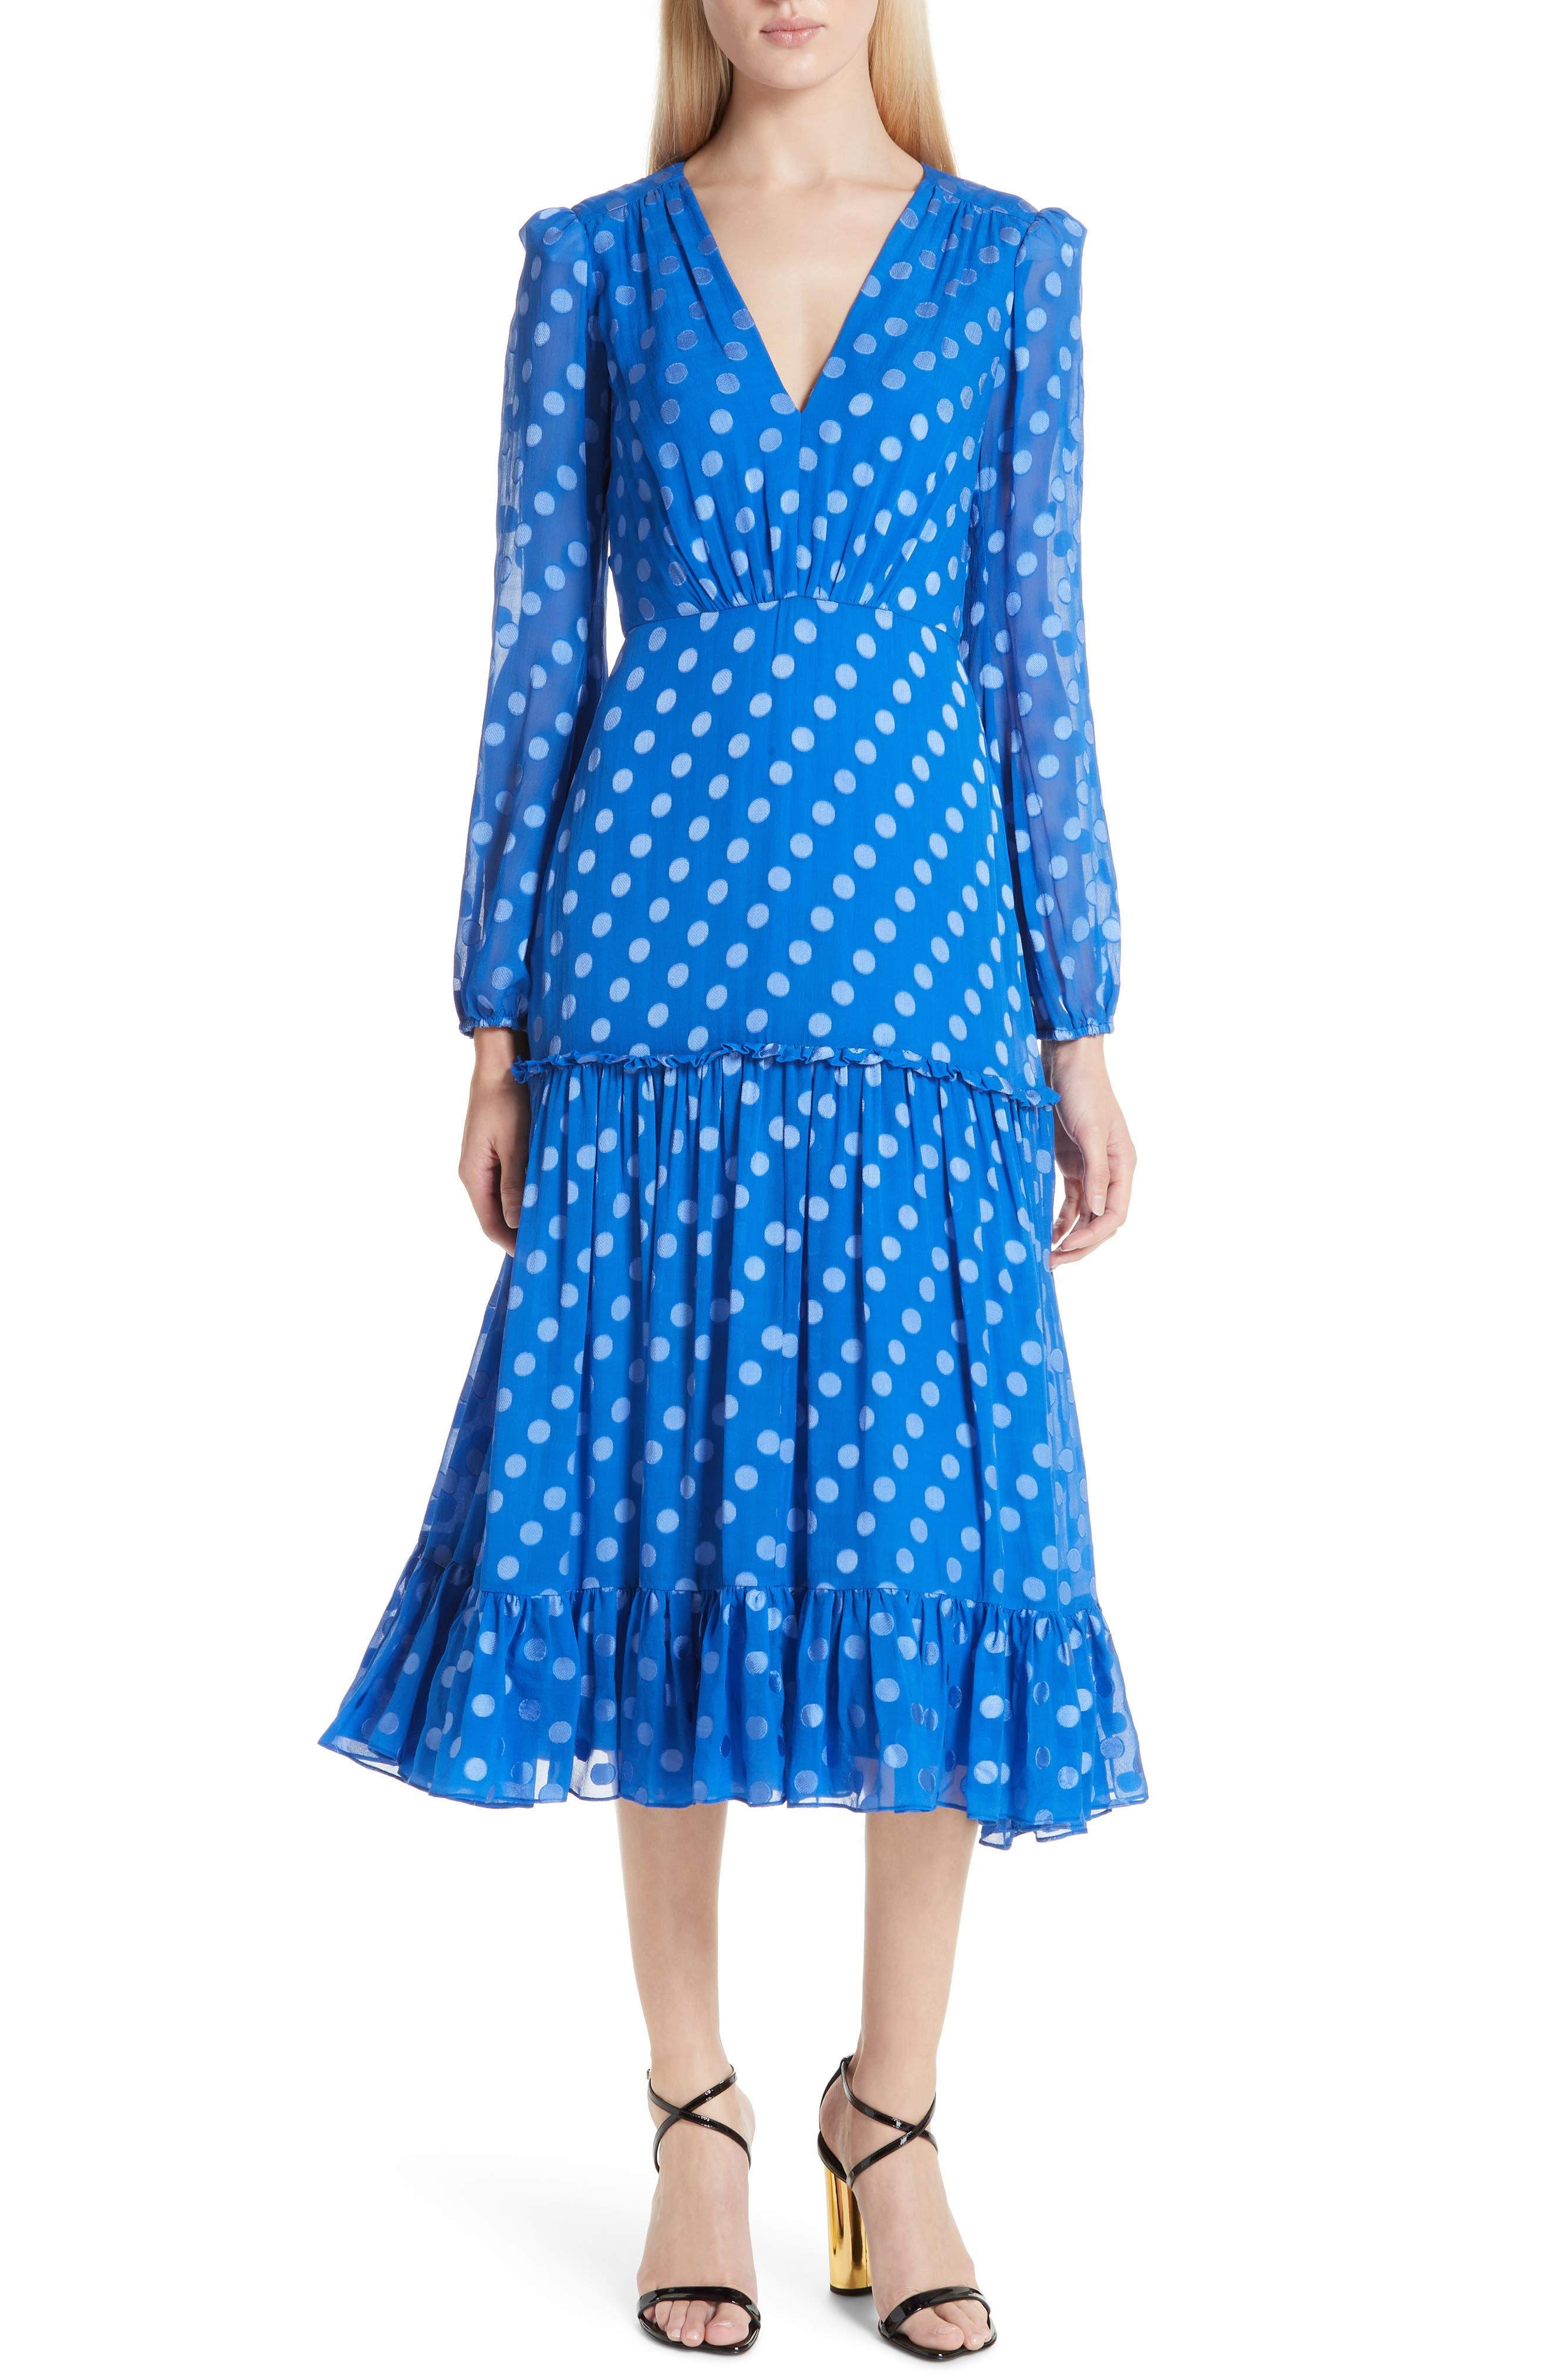 SALONI, Polka Dot Ruffle Dress, Alternate thumbnail 5, color, COBALT BLUE